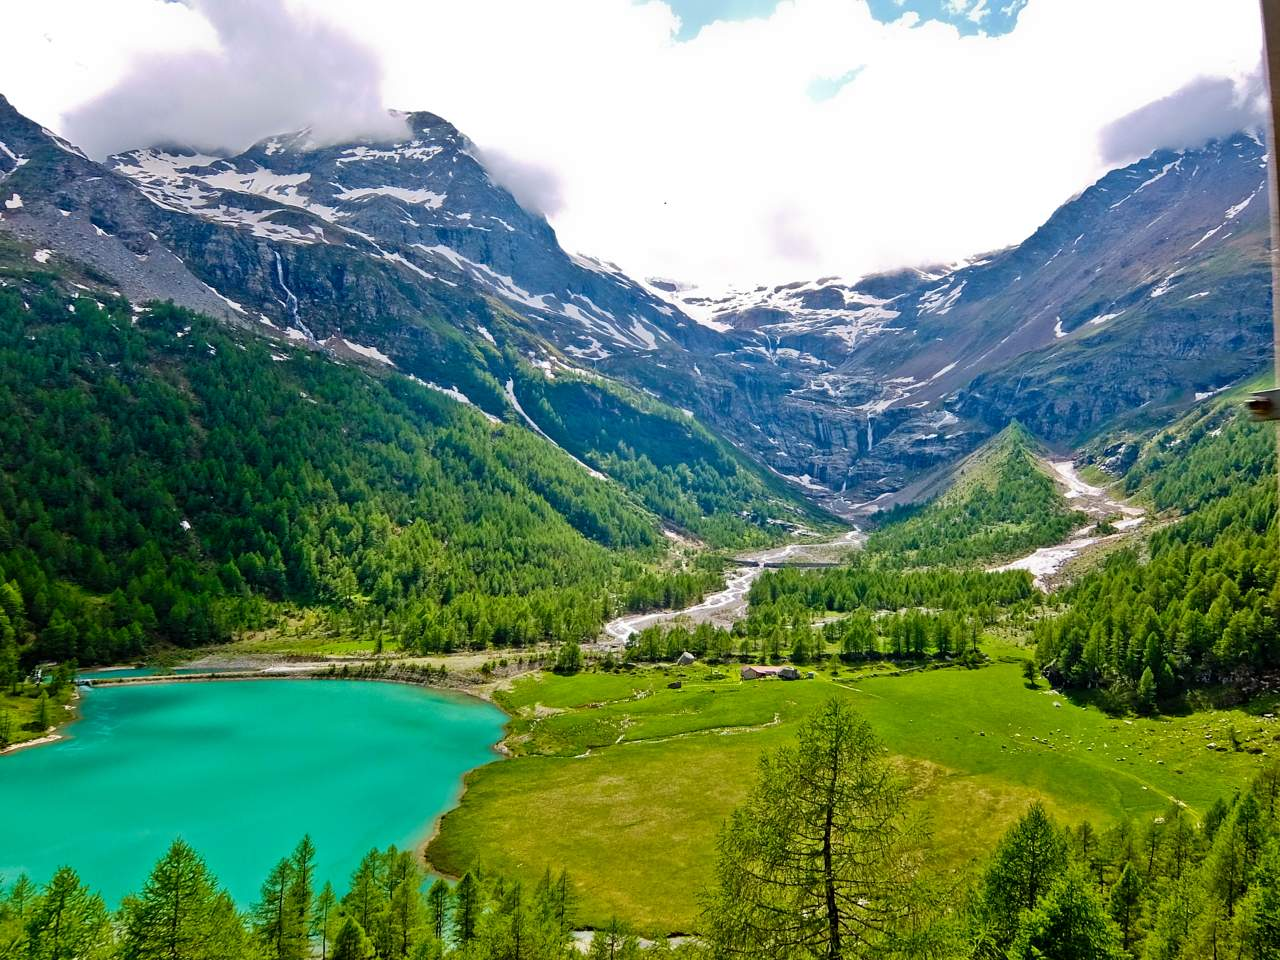 View from Alp Grum  Over the Alps via Gotthard Bernina Circular Tour on the Bernina Express View from Alp Grum